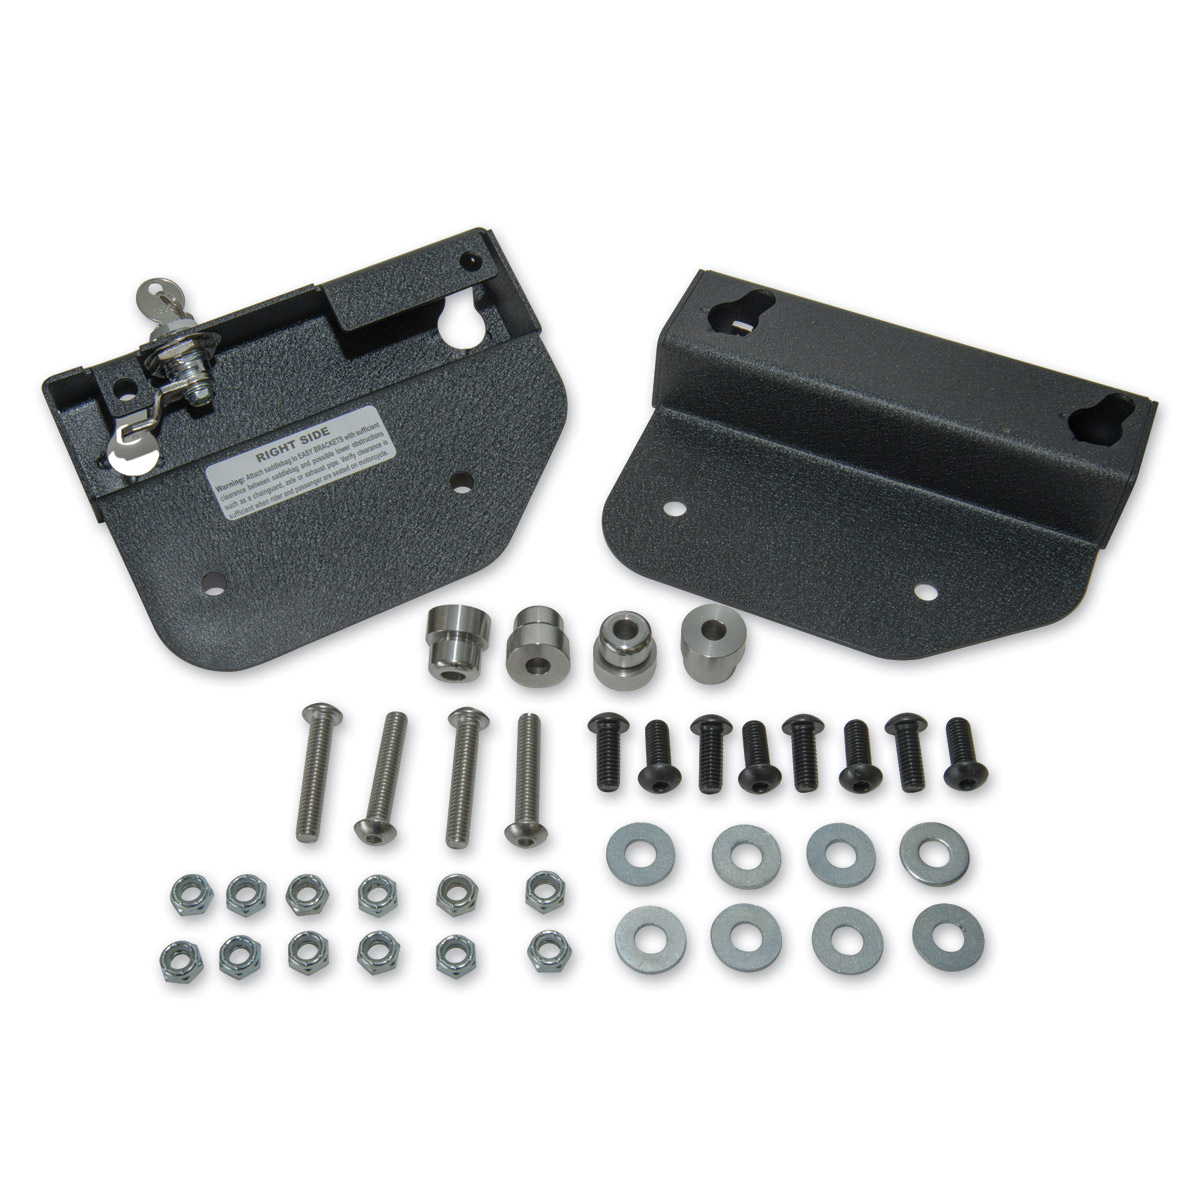 hight resolution of easy brackets saddlebag mounting system